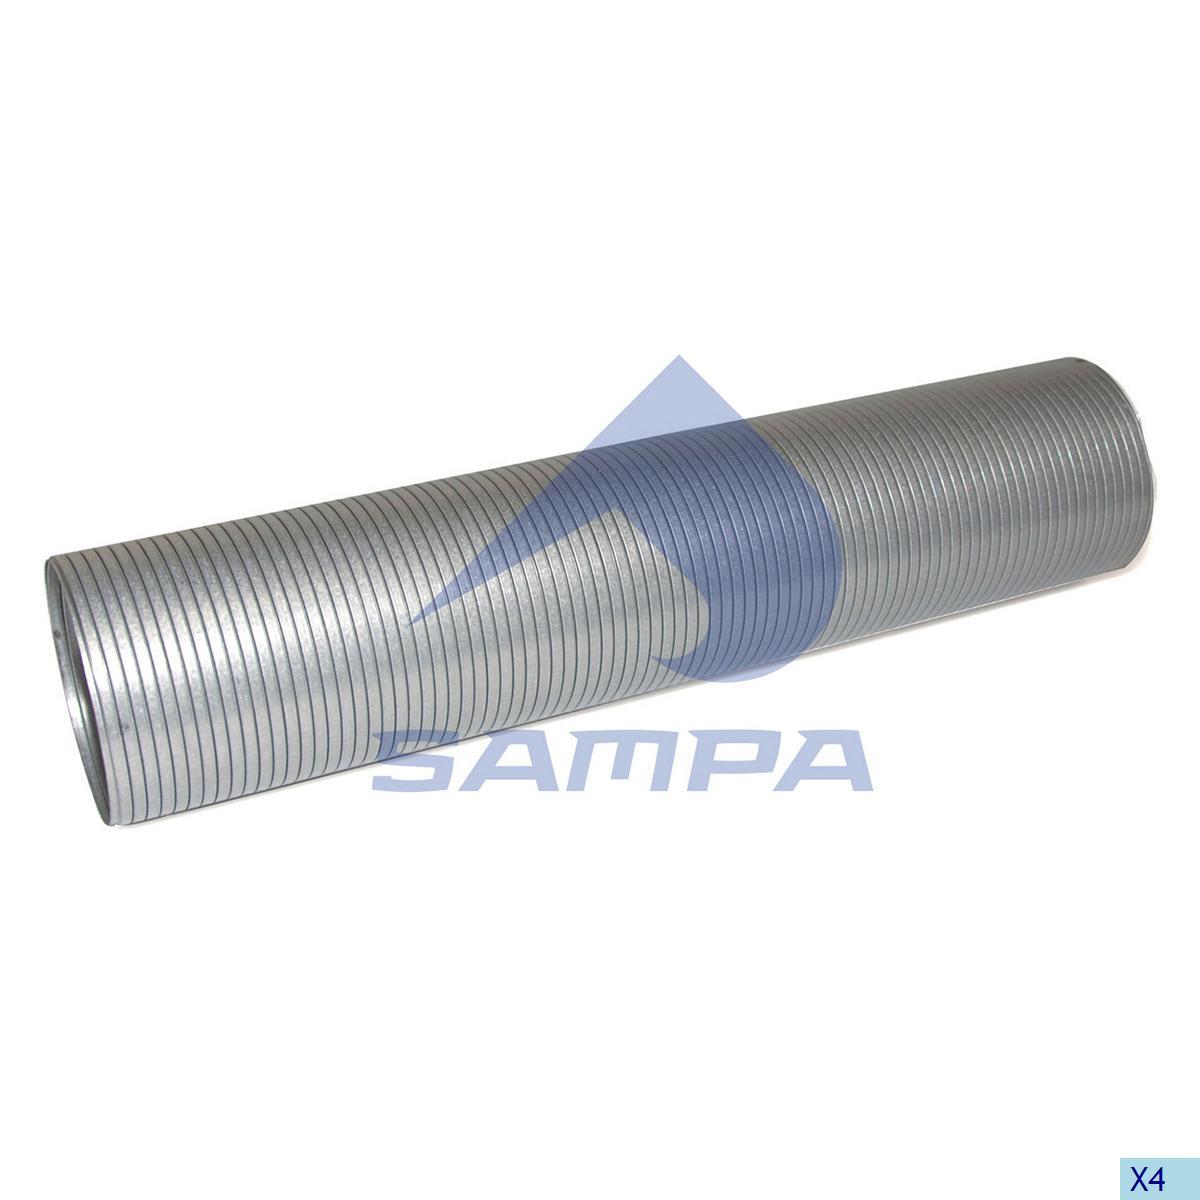 Flexible Pipe, Exhaust, Volvo, Engine